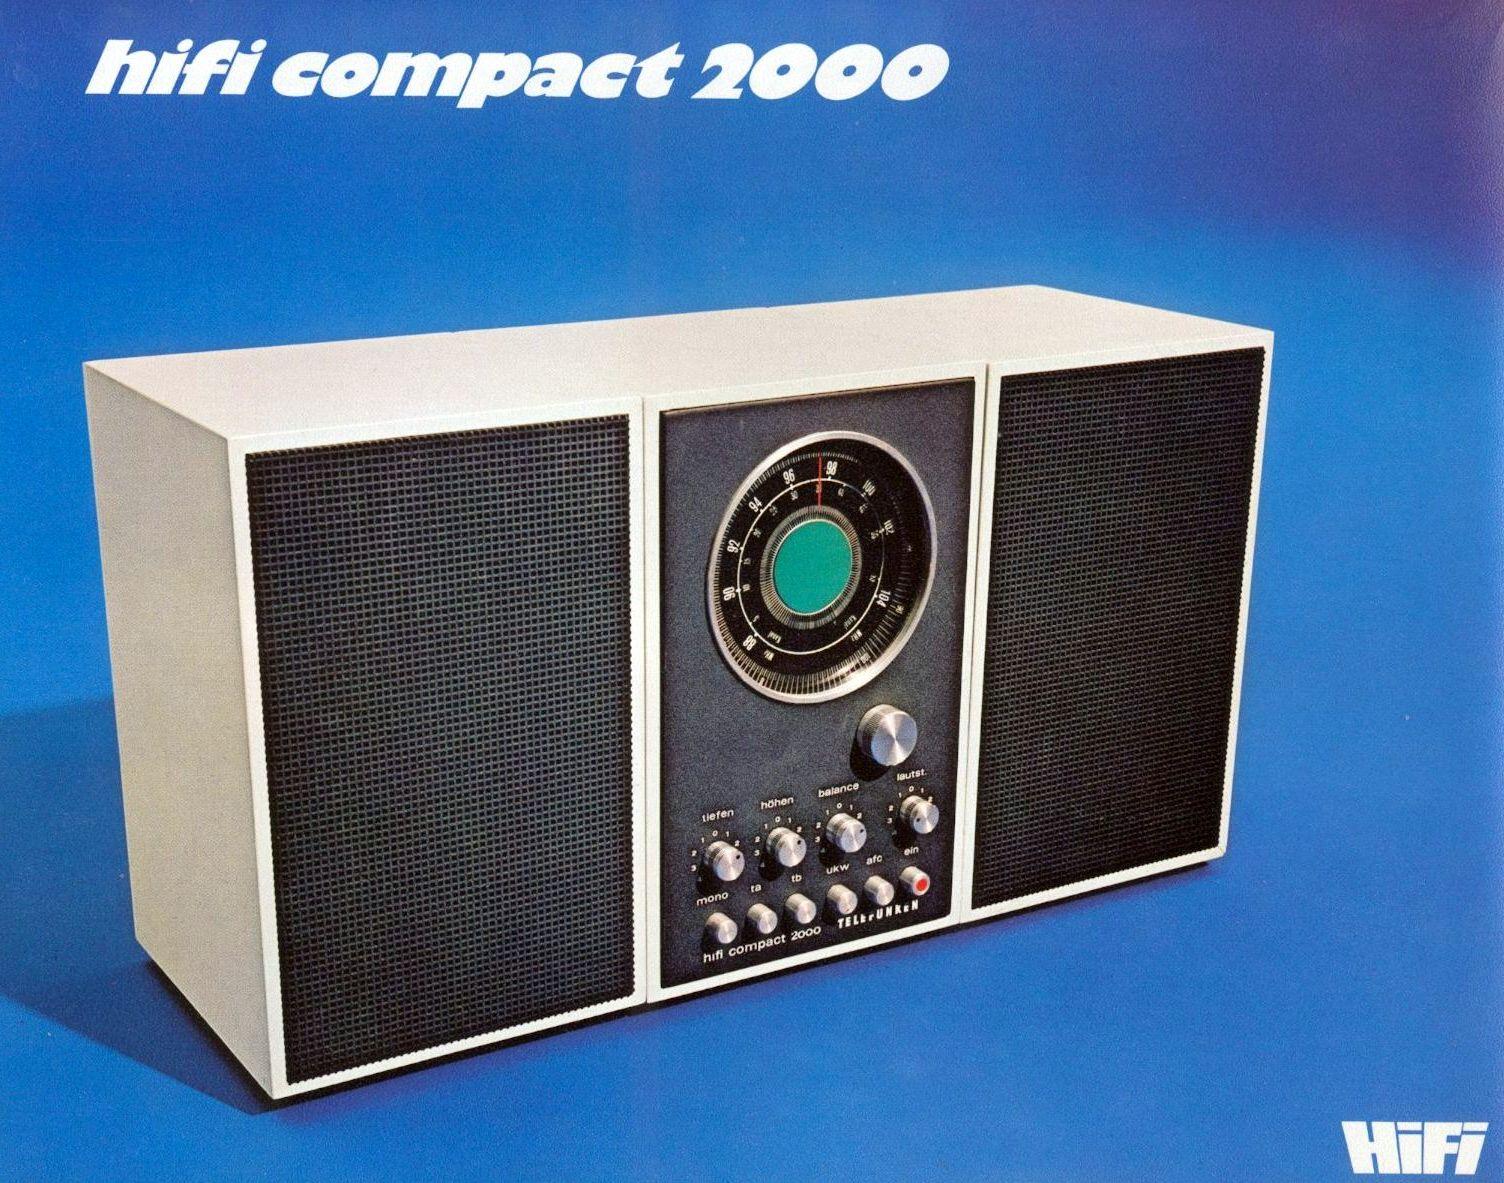 [Bild: Telefunken_Hifi_Compact_2000-Prospekt-1.jpg]